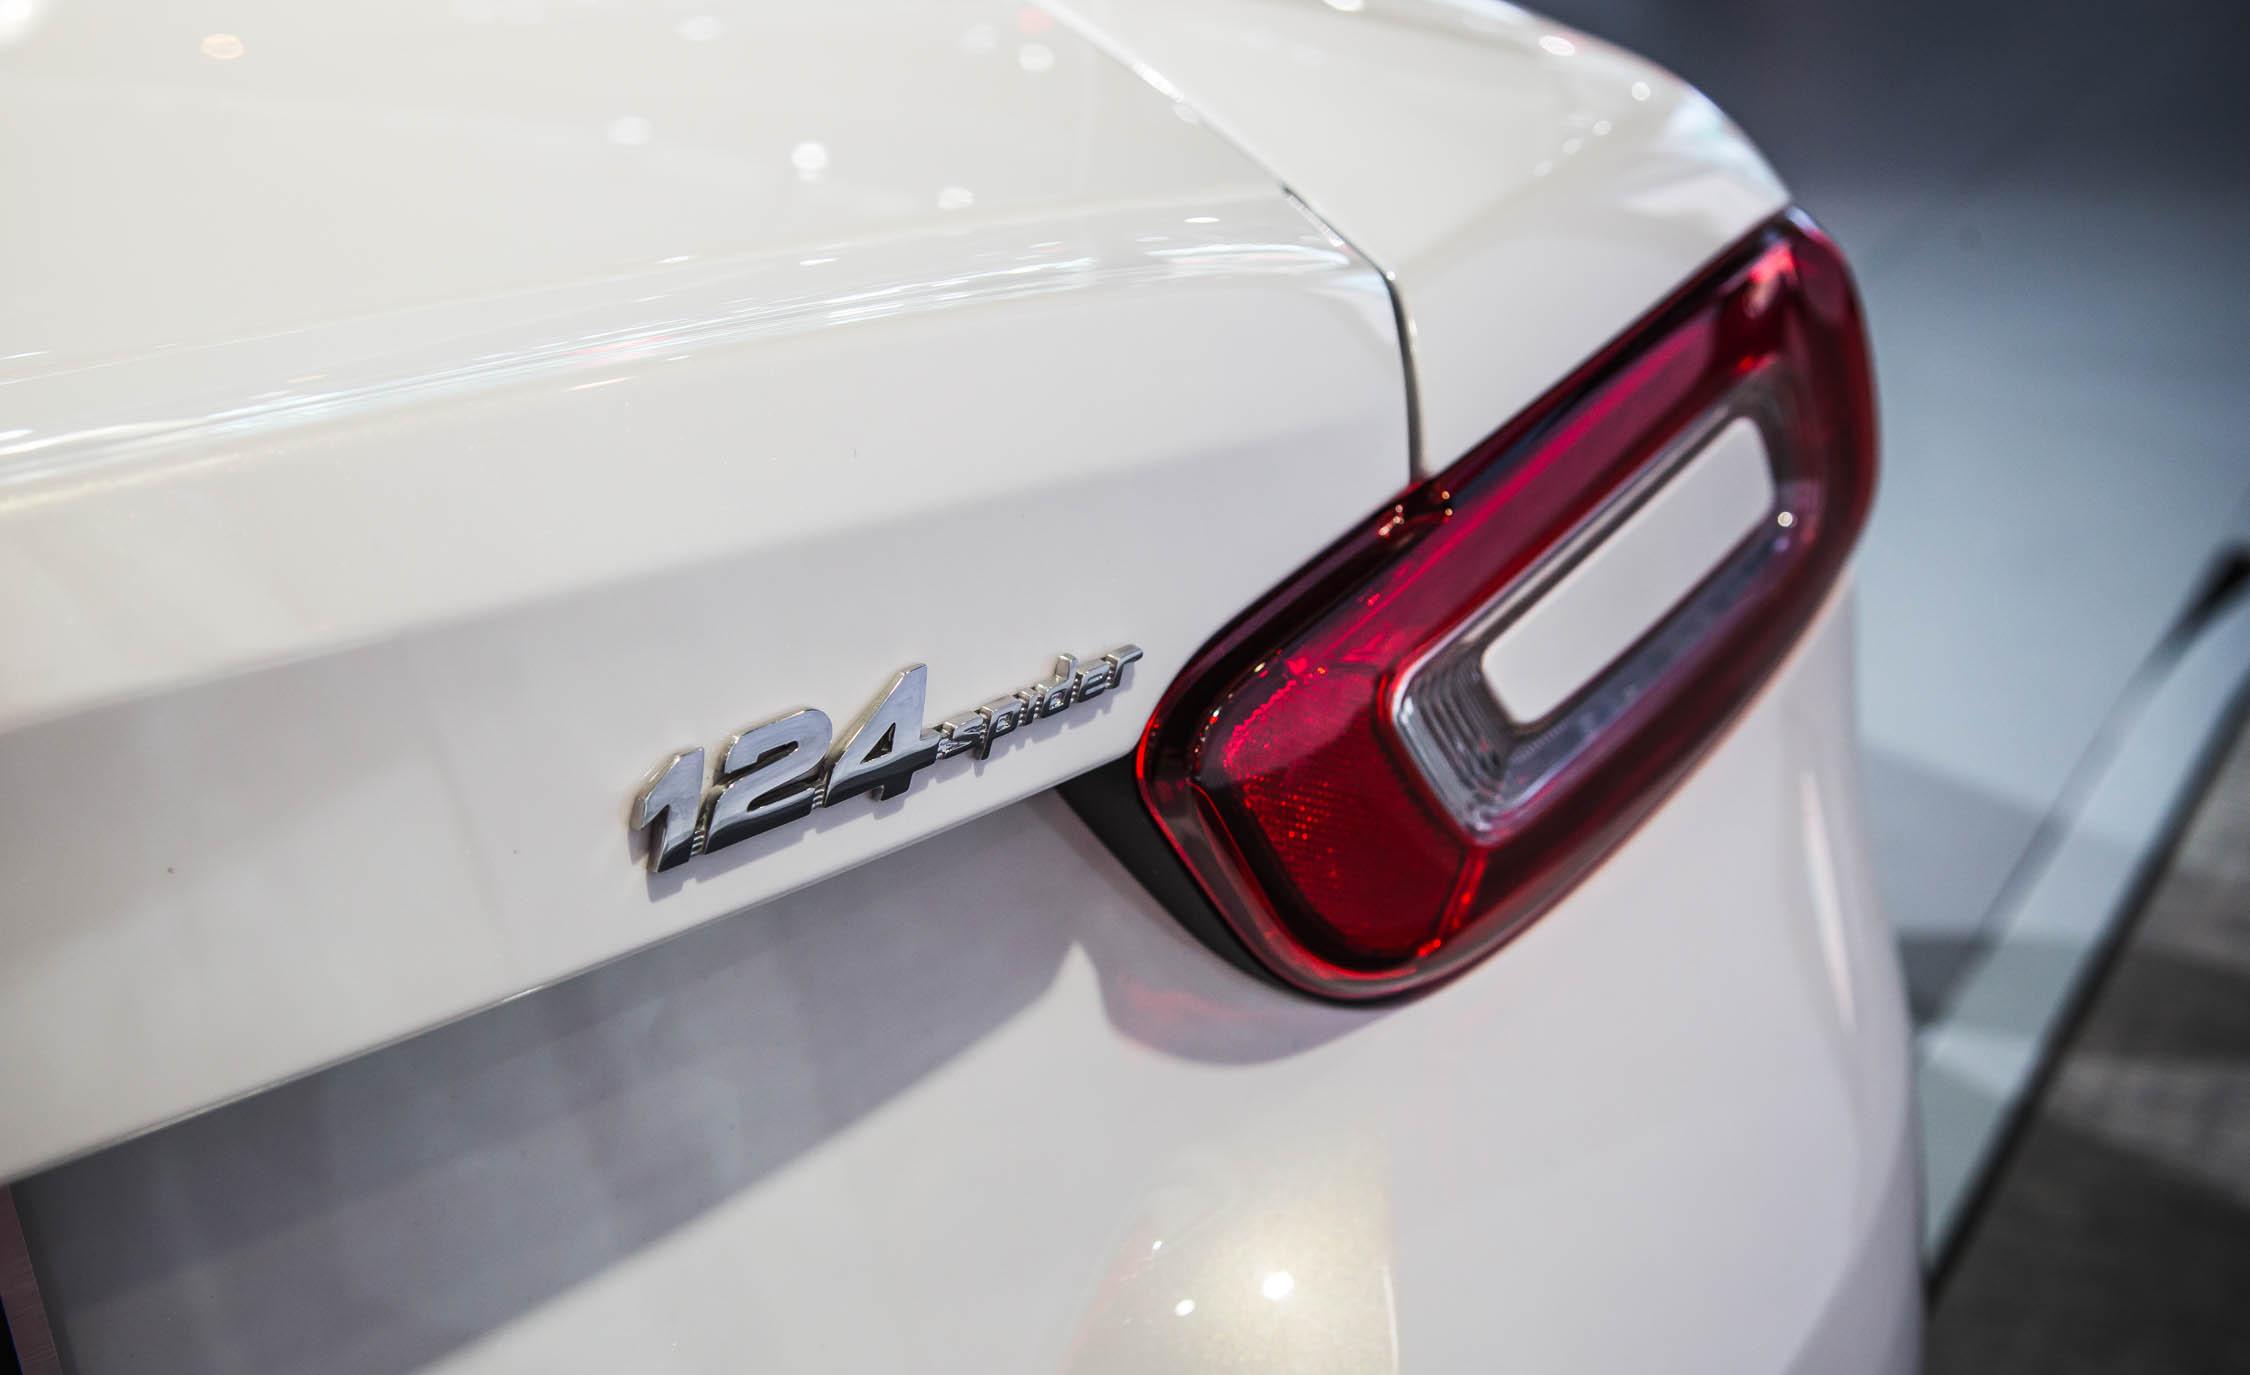 2017 Fiat 124 Spider Rear Emblem (Photo 19 of 23)